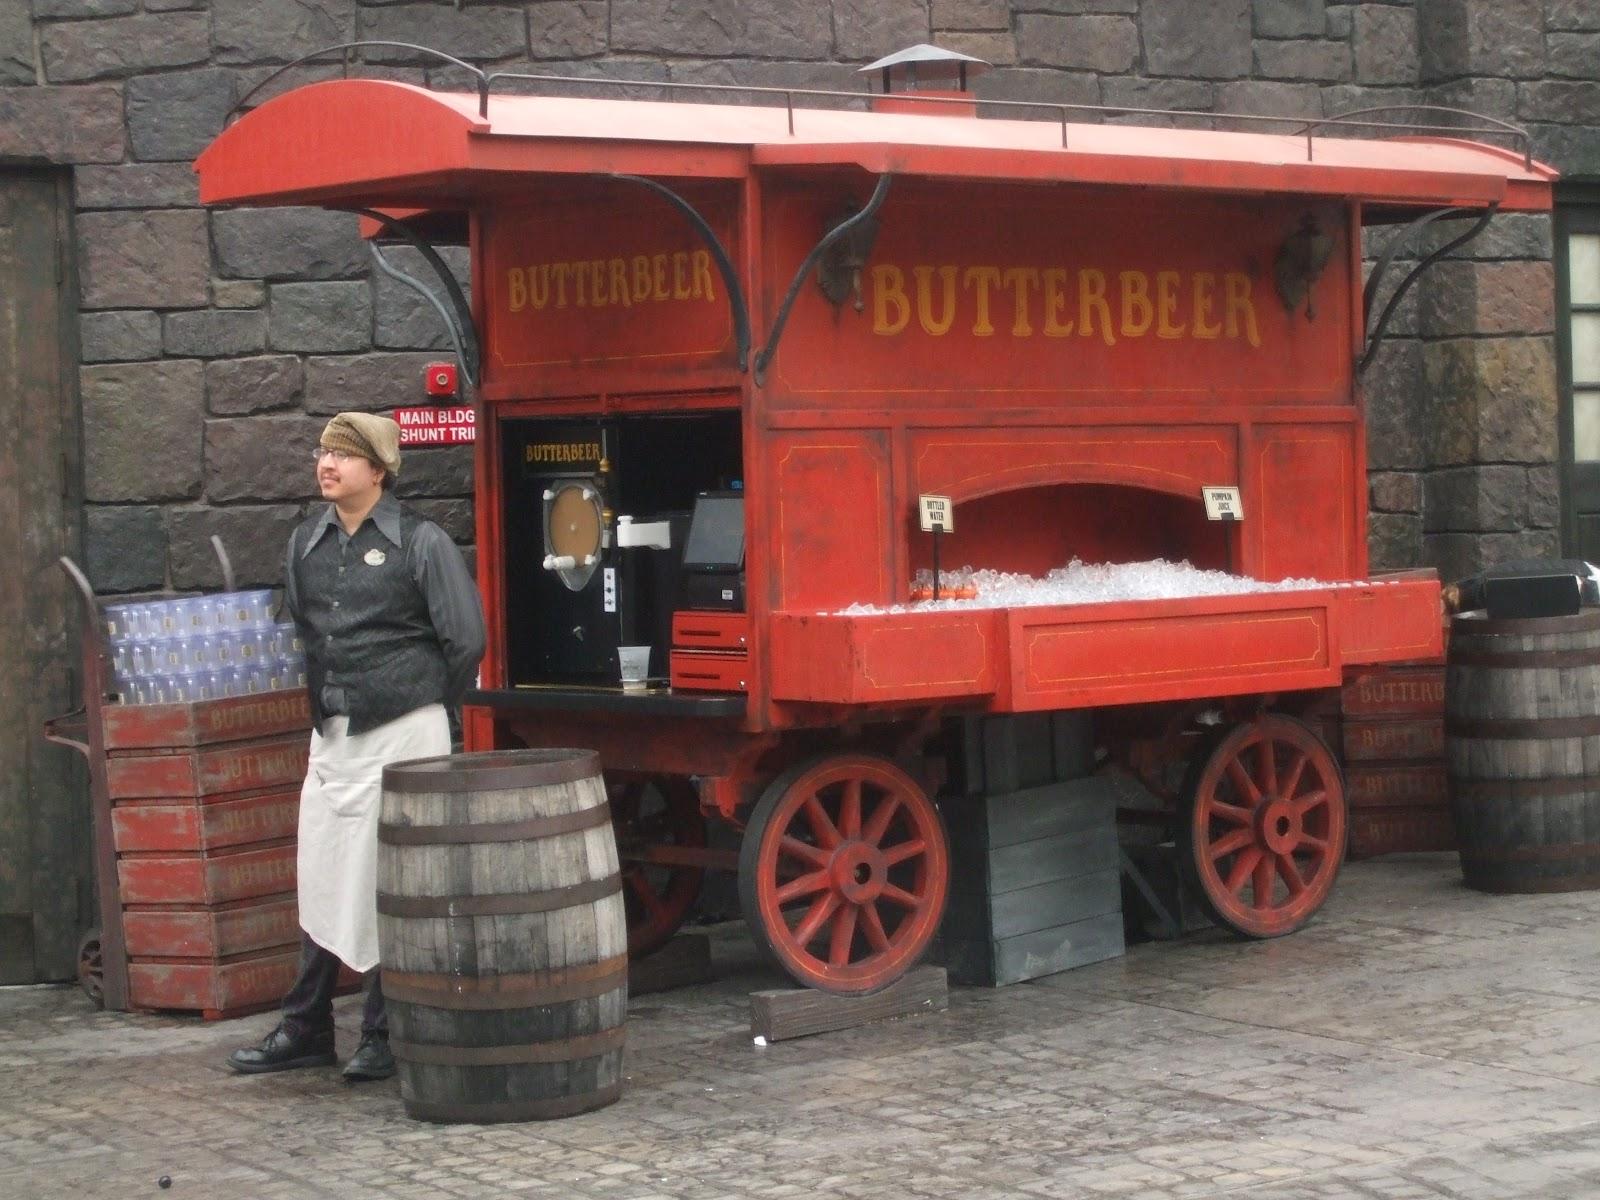 how to make universal studios butterbeer